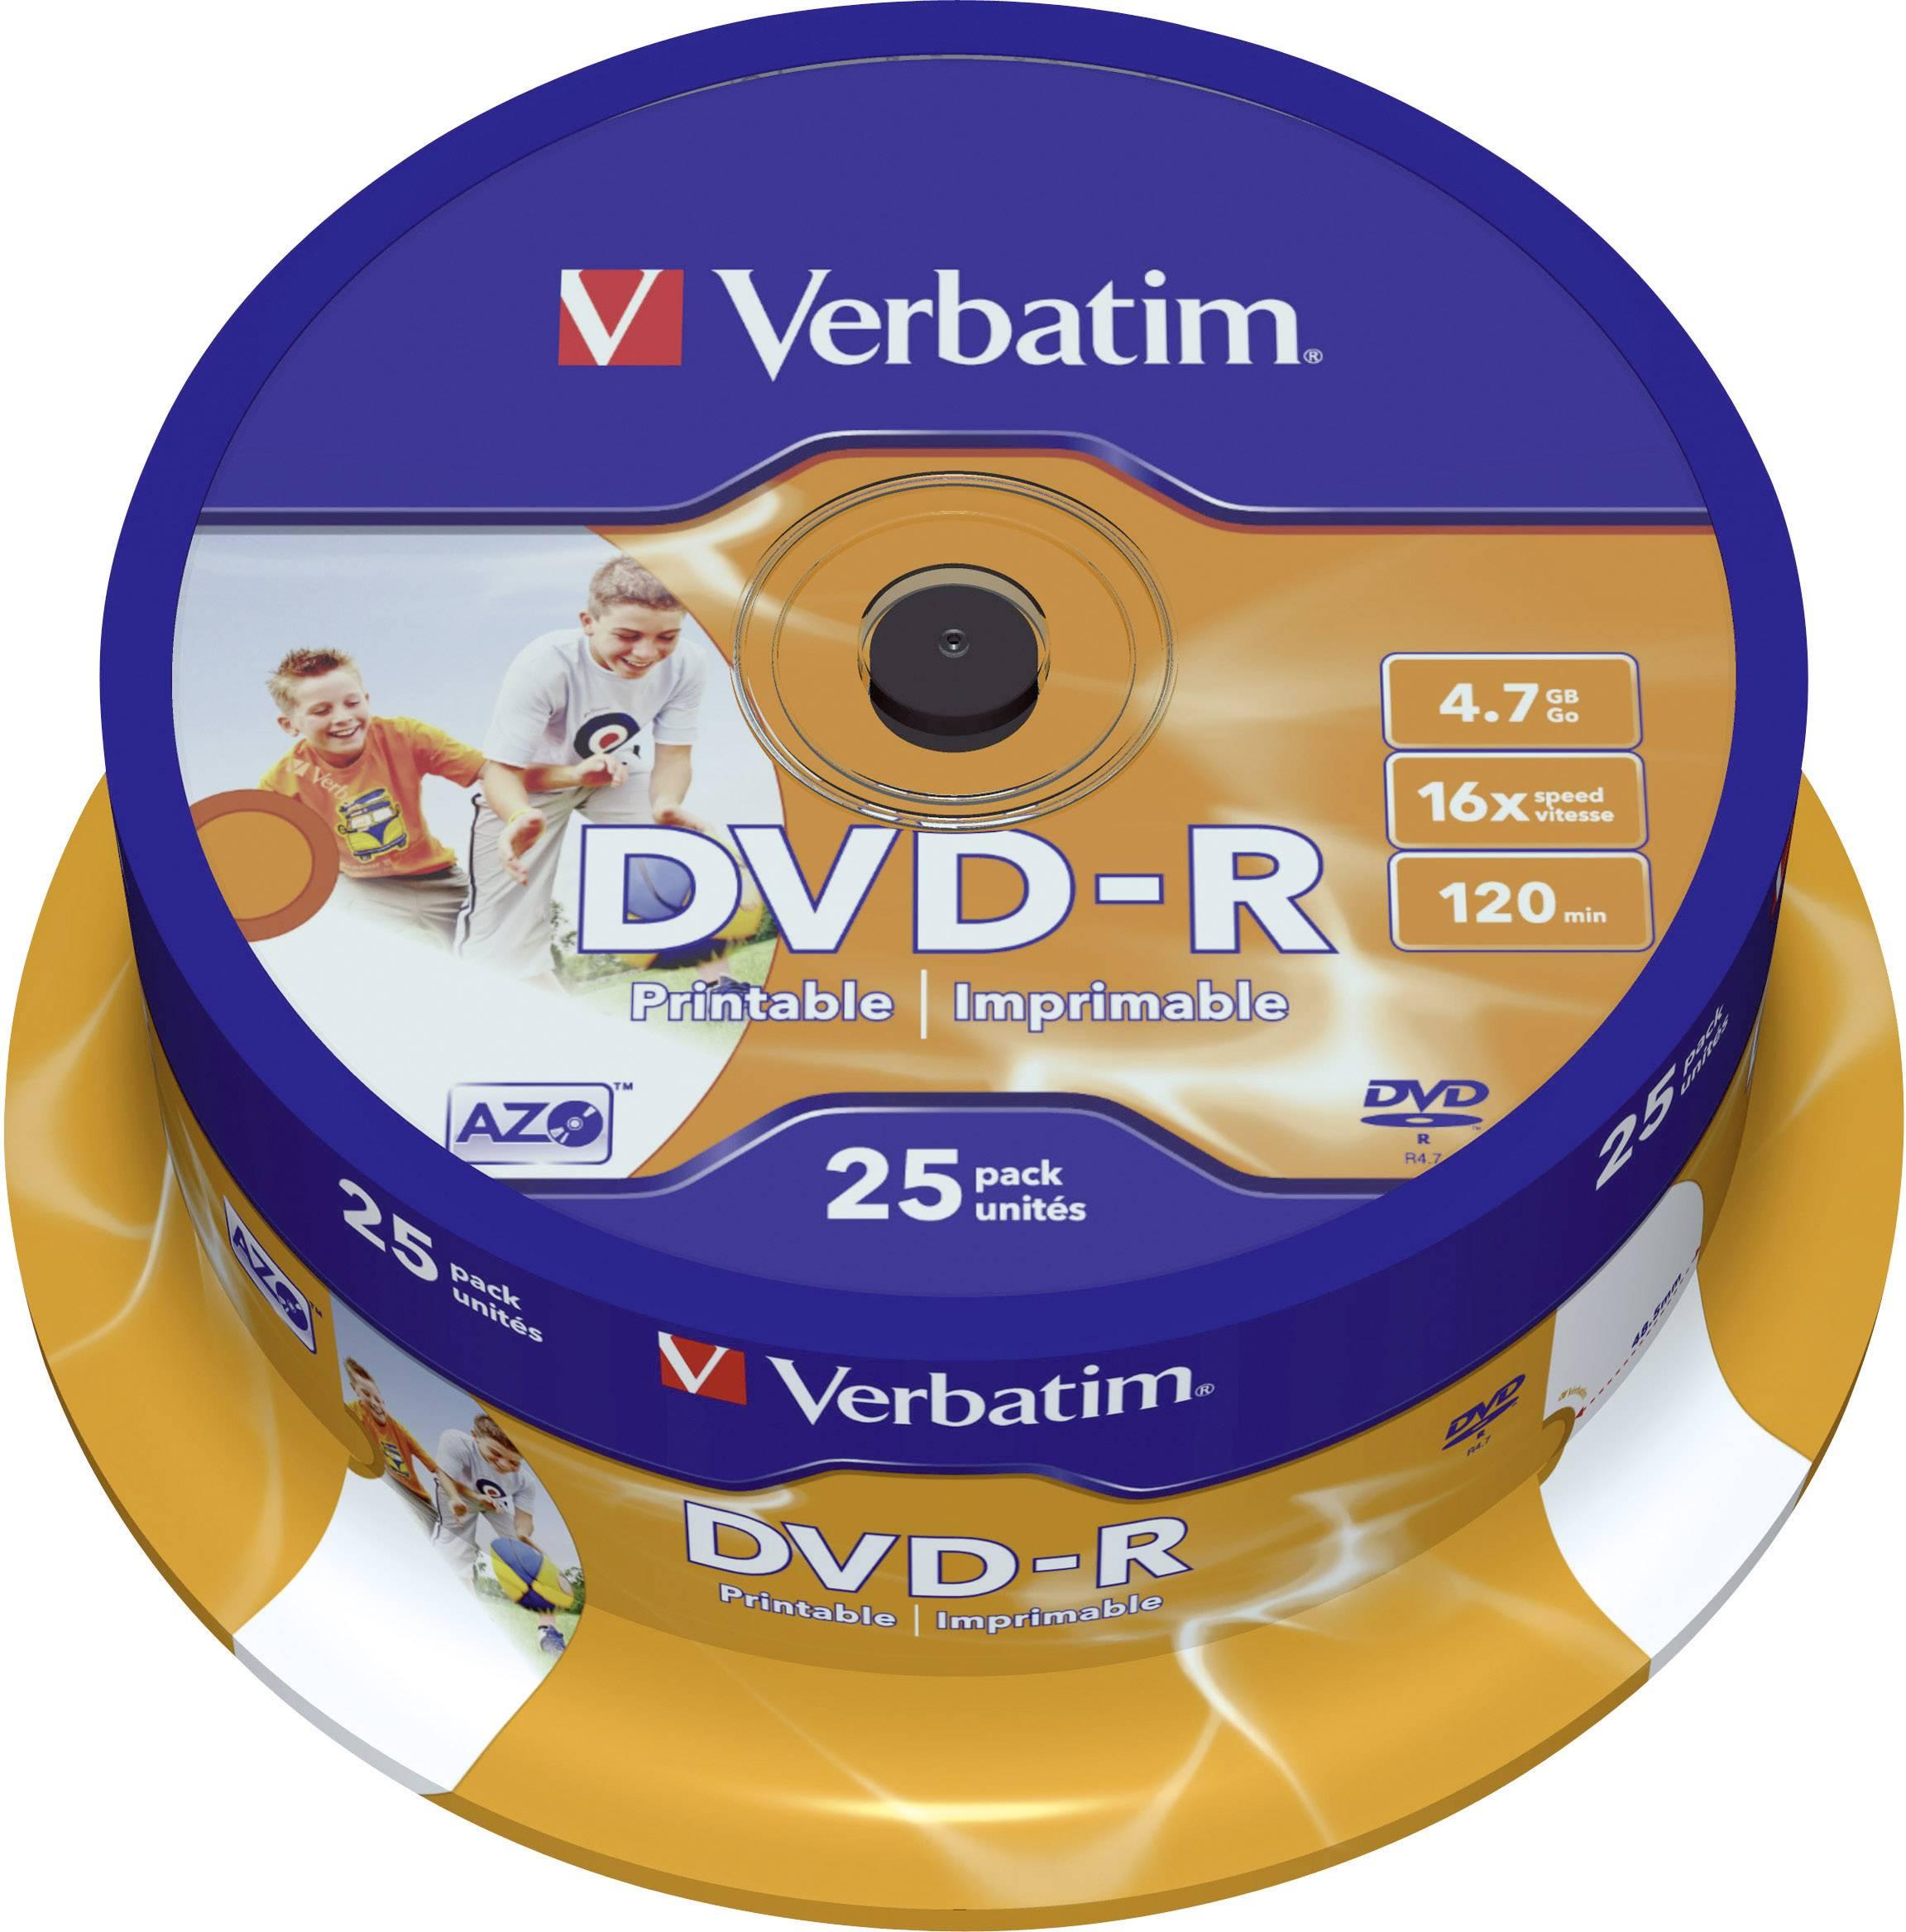 DVD-R 4.7 GB Verbatim 43538, možnosť potlače, 25 ks, vreteno